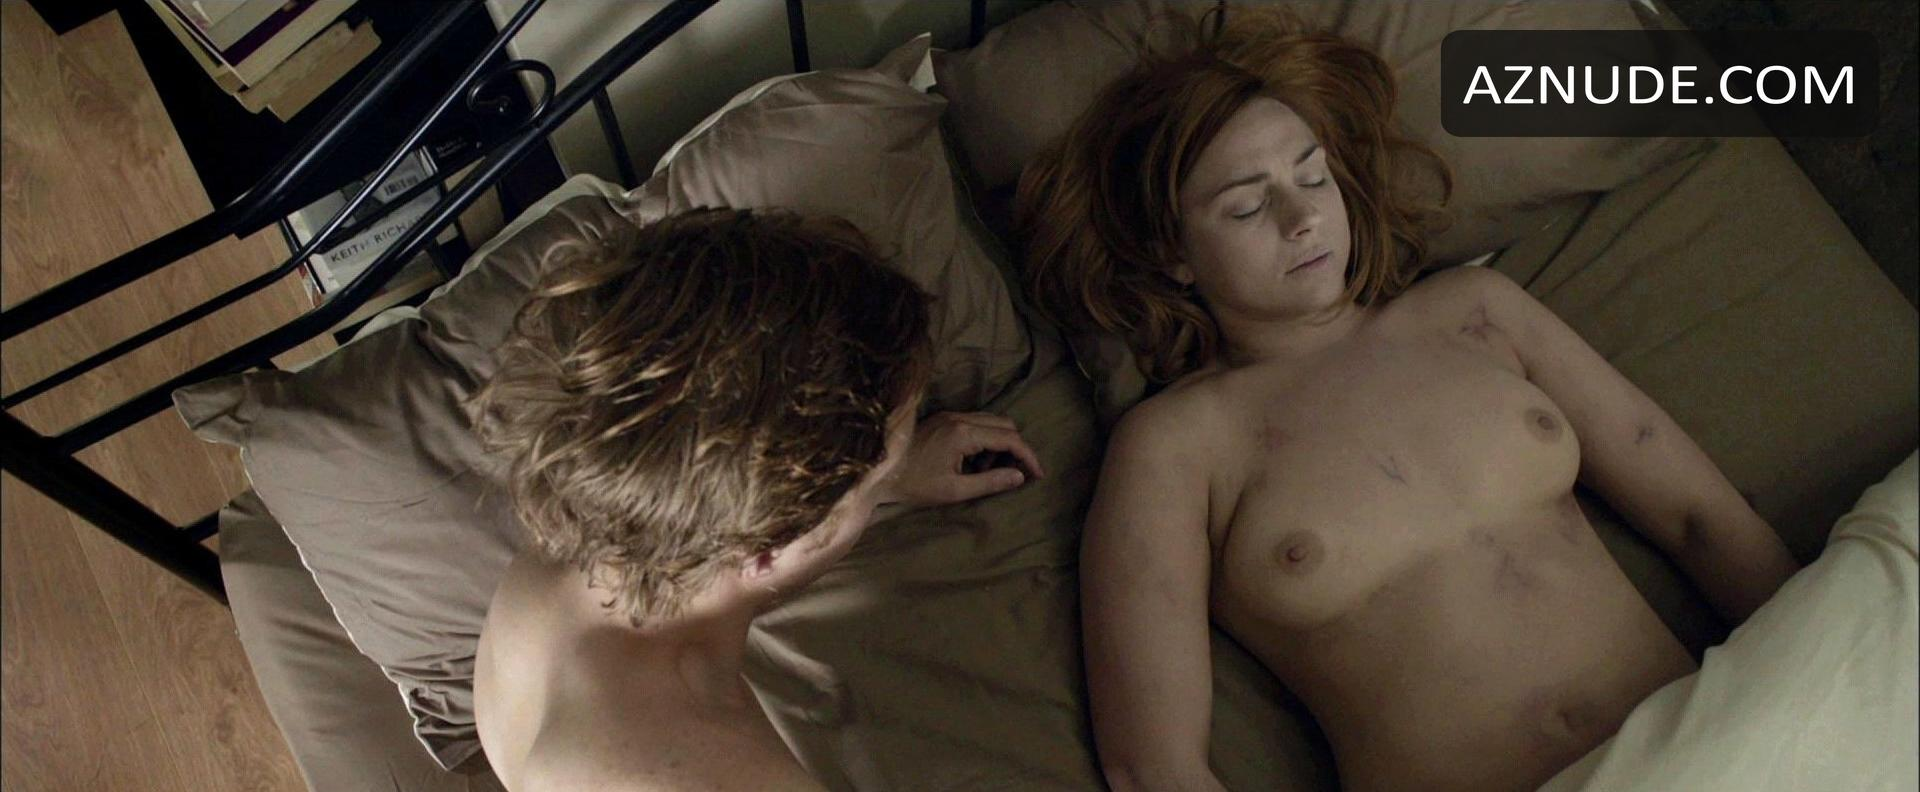 Amy Ryan Naked amanda ryan nude - aznude